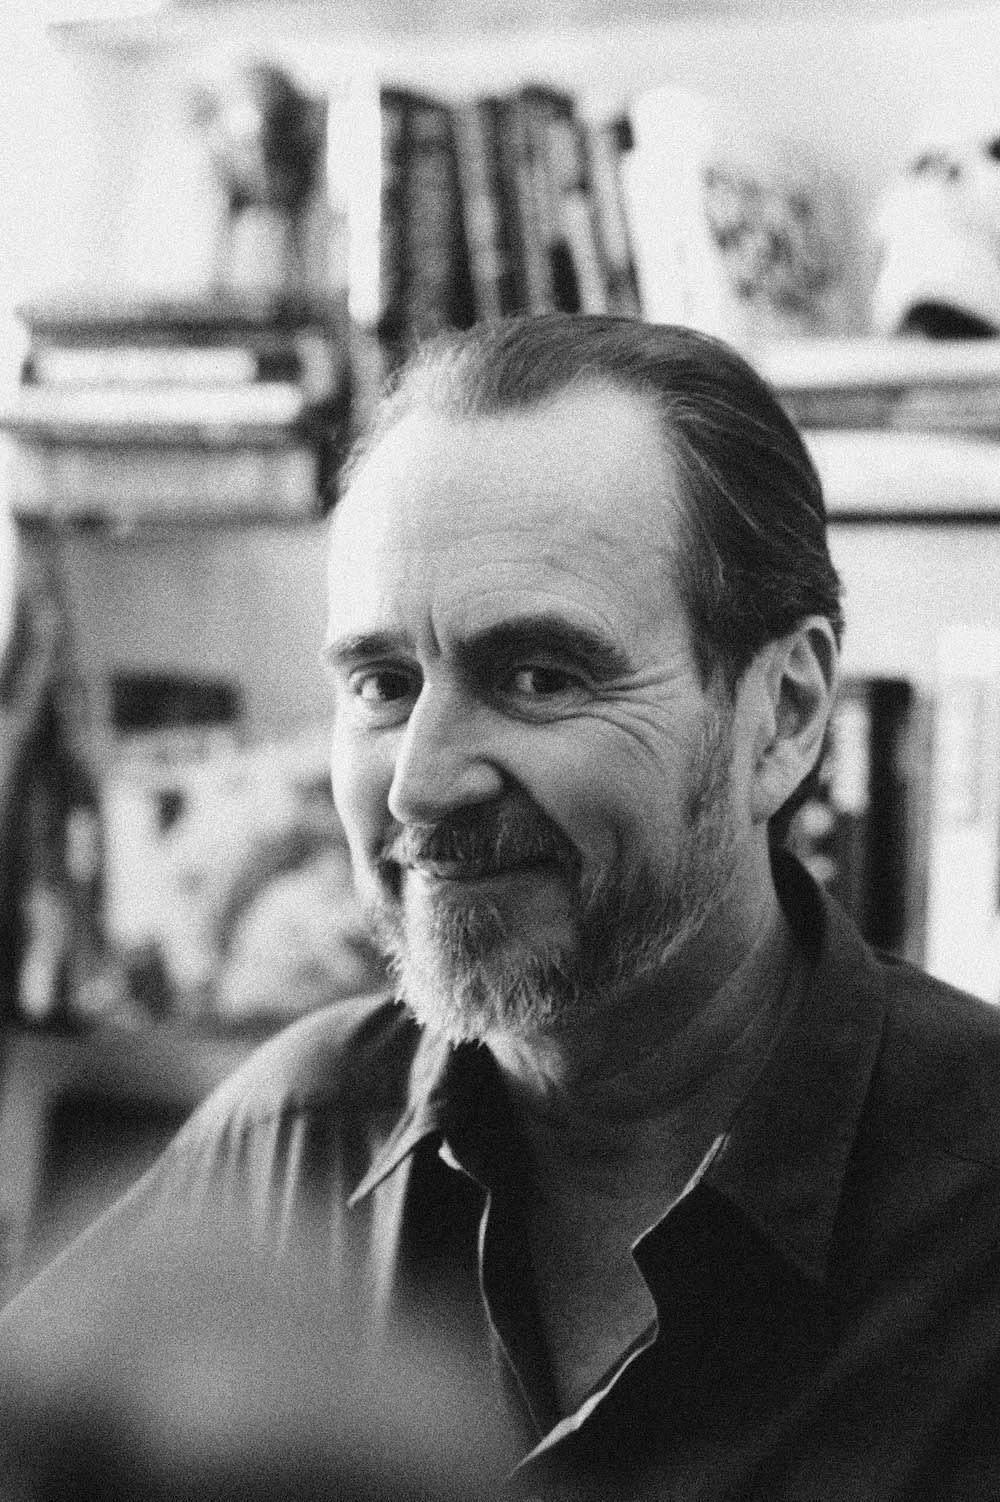 Wes Craven (1939-2015) http://www.wescraven.com/